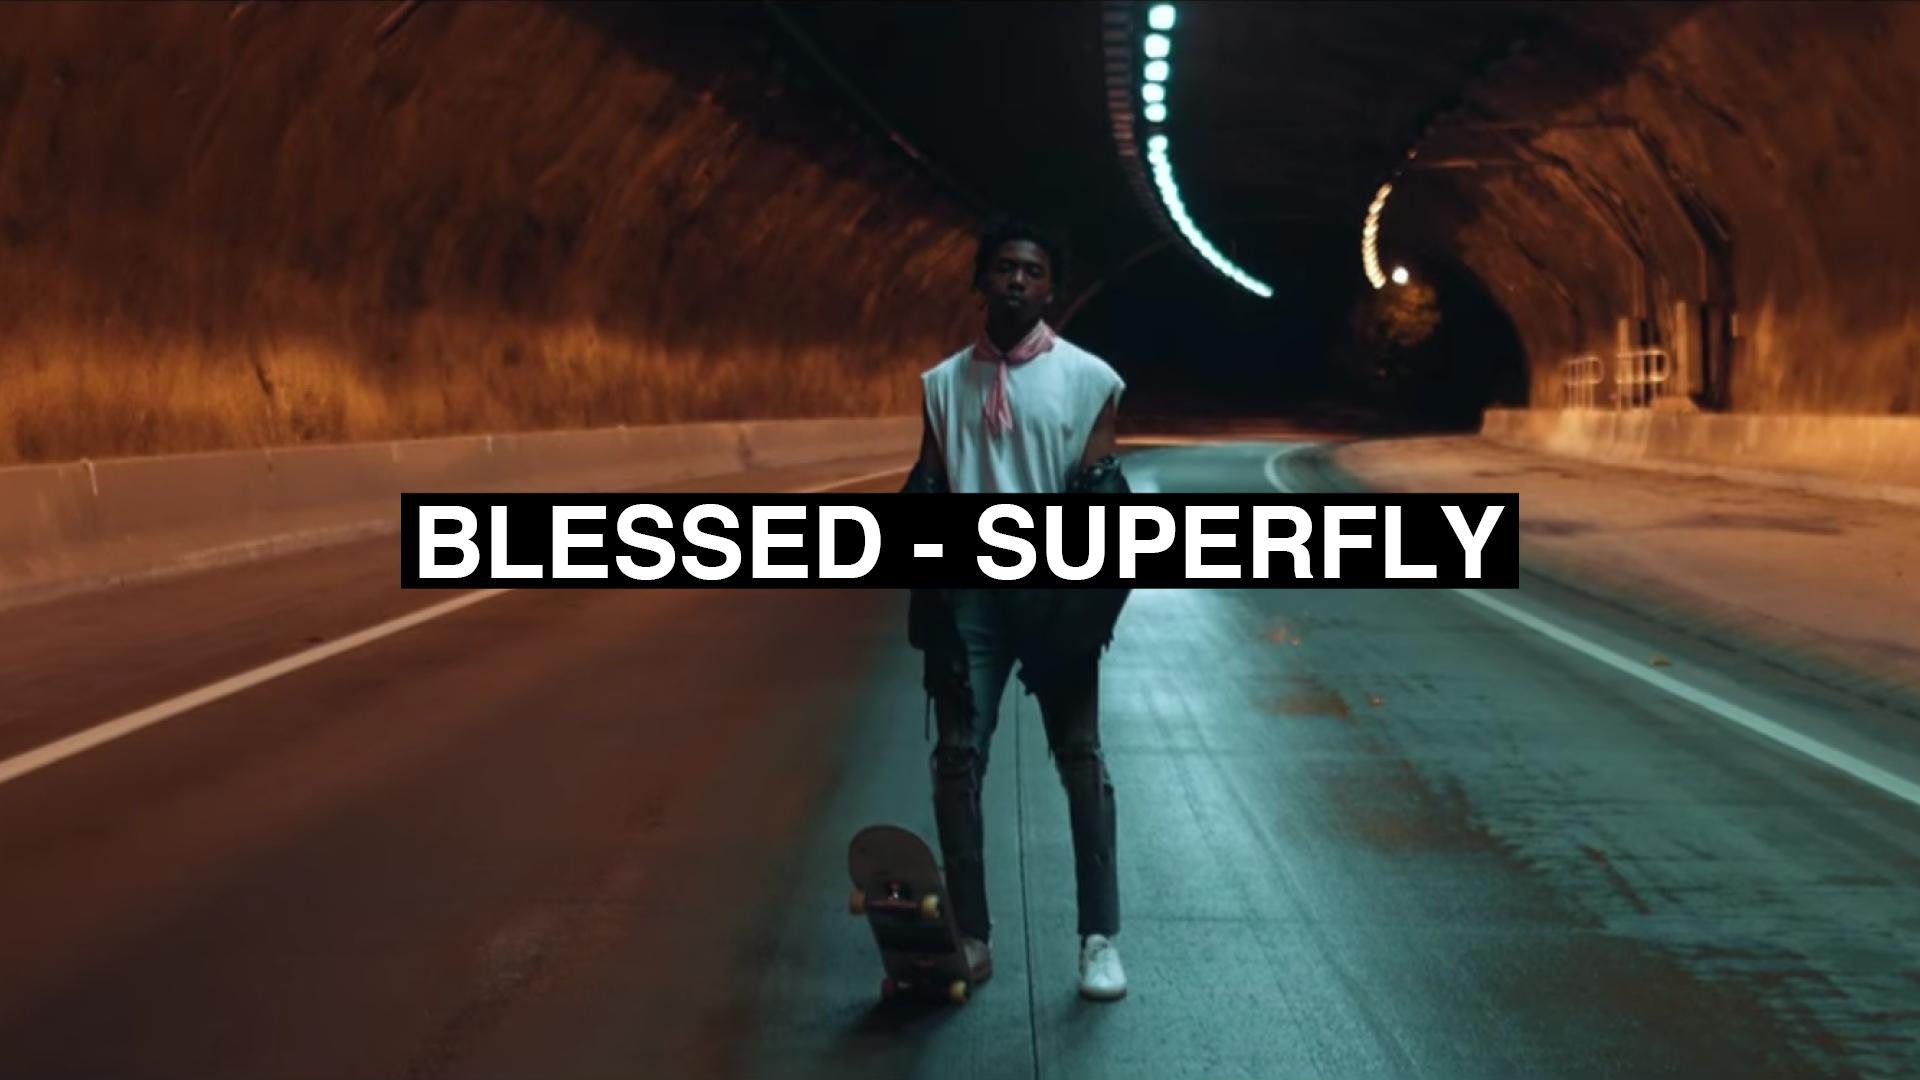 superfly.jpg